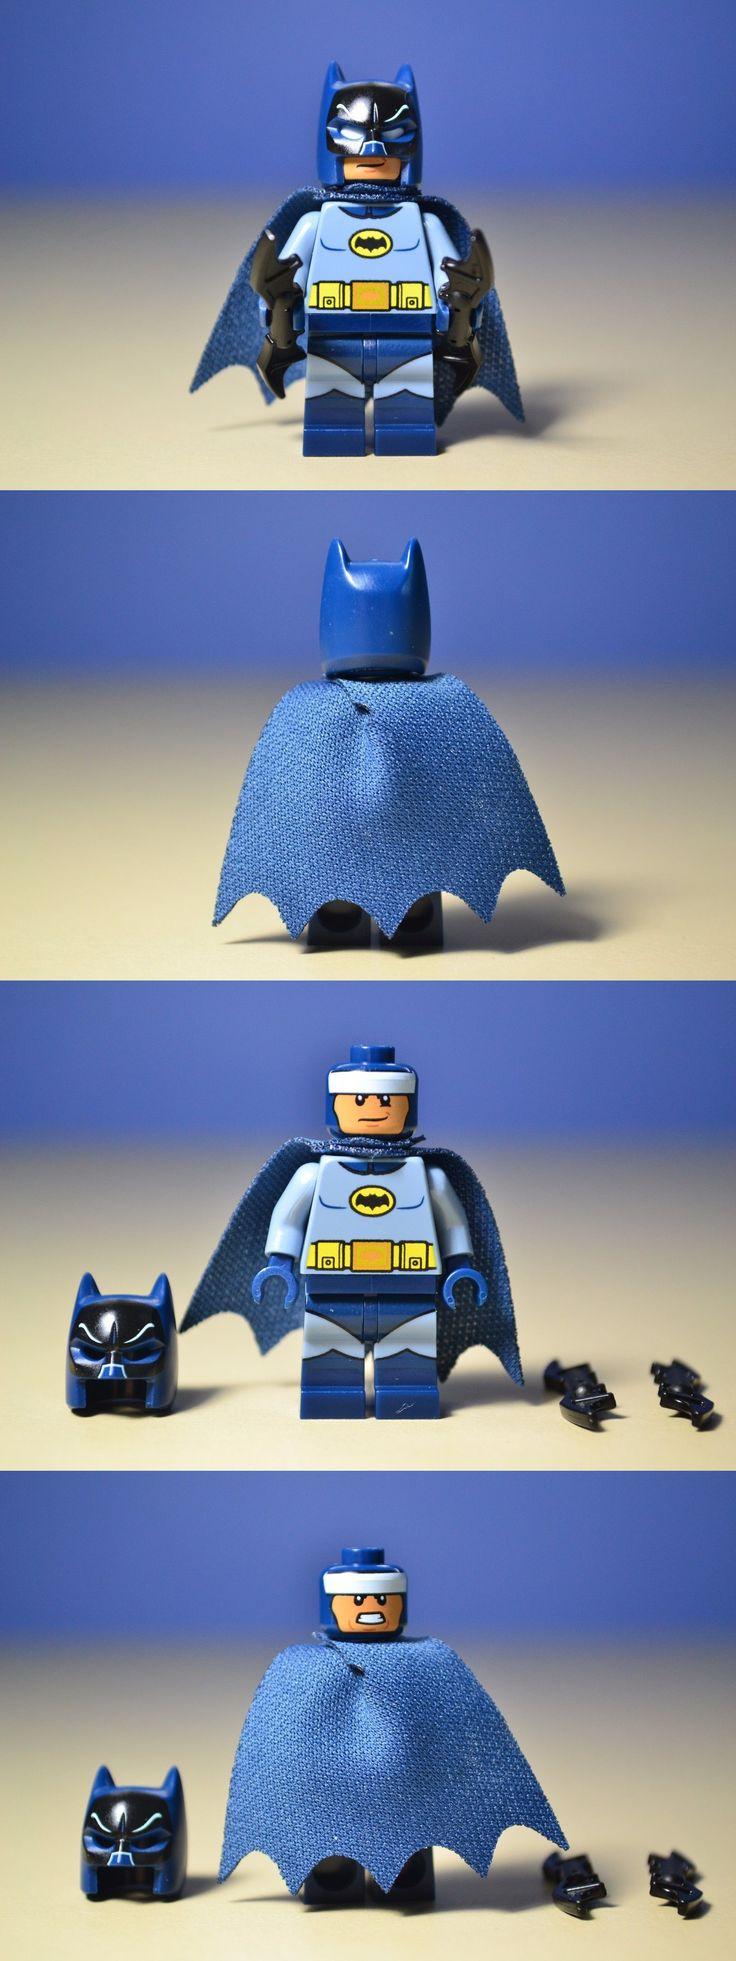 Minifigures 19001: Lego Dc Universe Batman Classic Tv Series 76052 Batman Minifigure -> BUY IT NOW ONLY: $39.75 on eBay!